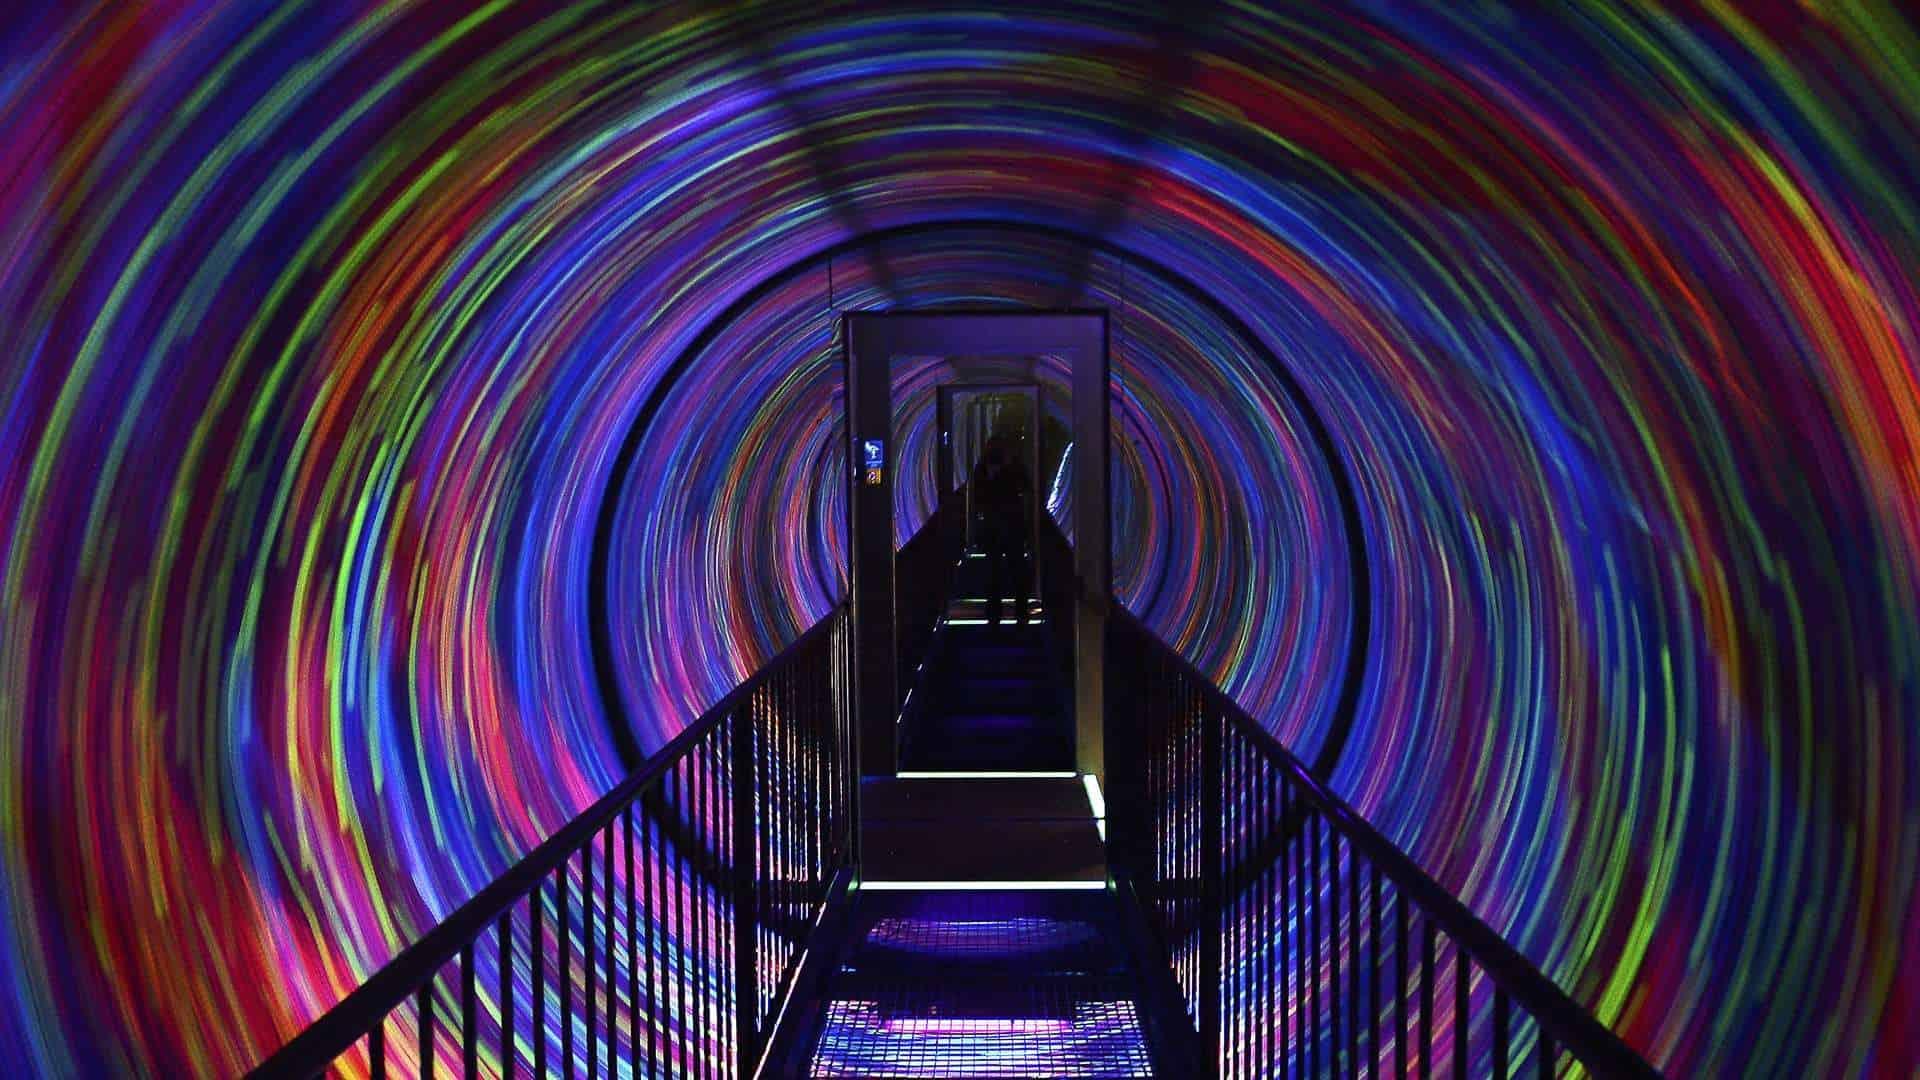 windows 10 wallpaper hd,blue,light,purple,violet,psychedelic art